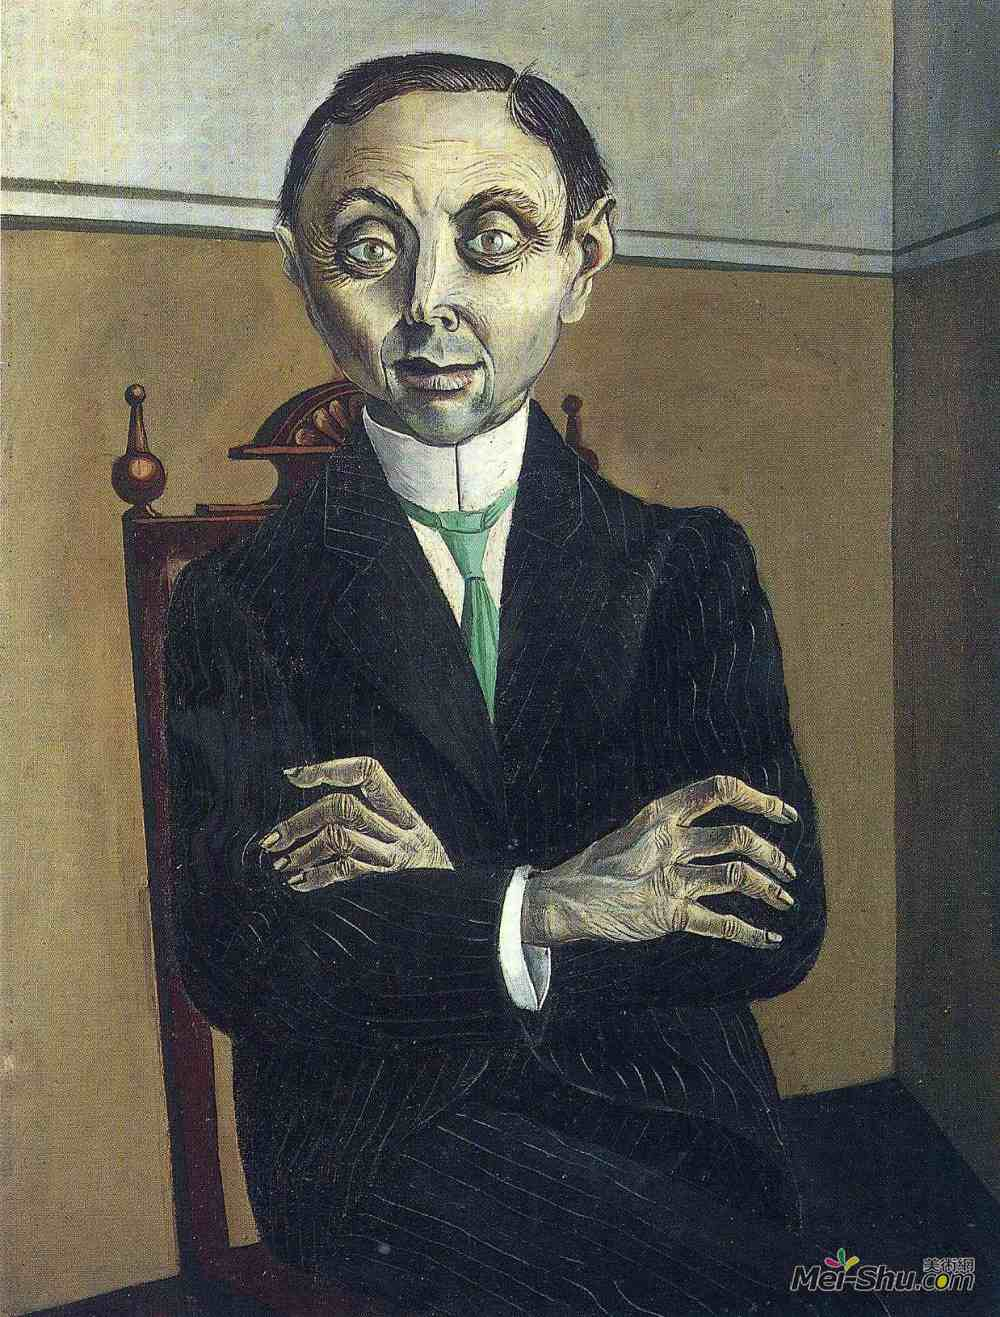 奥托·迪克斯(Otto Dix)高清作品《Portrait of Paul F. Schmidt》